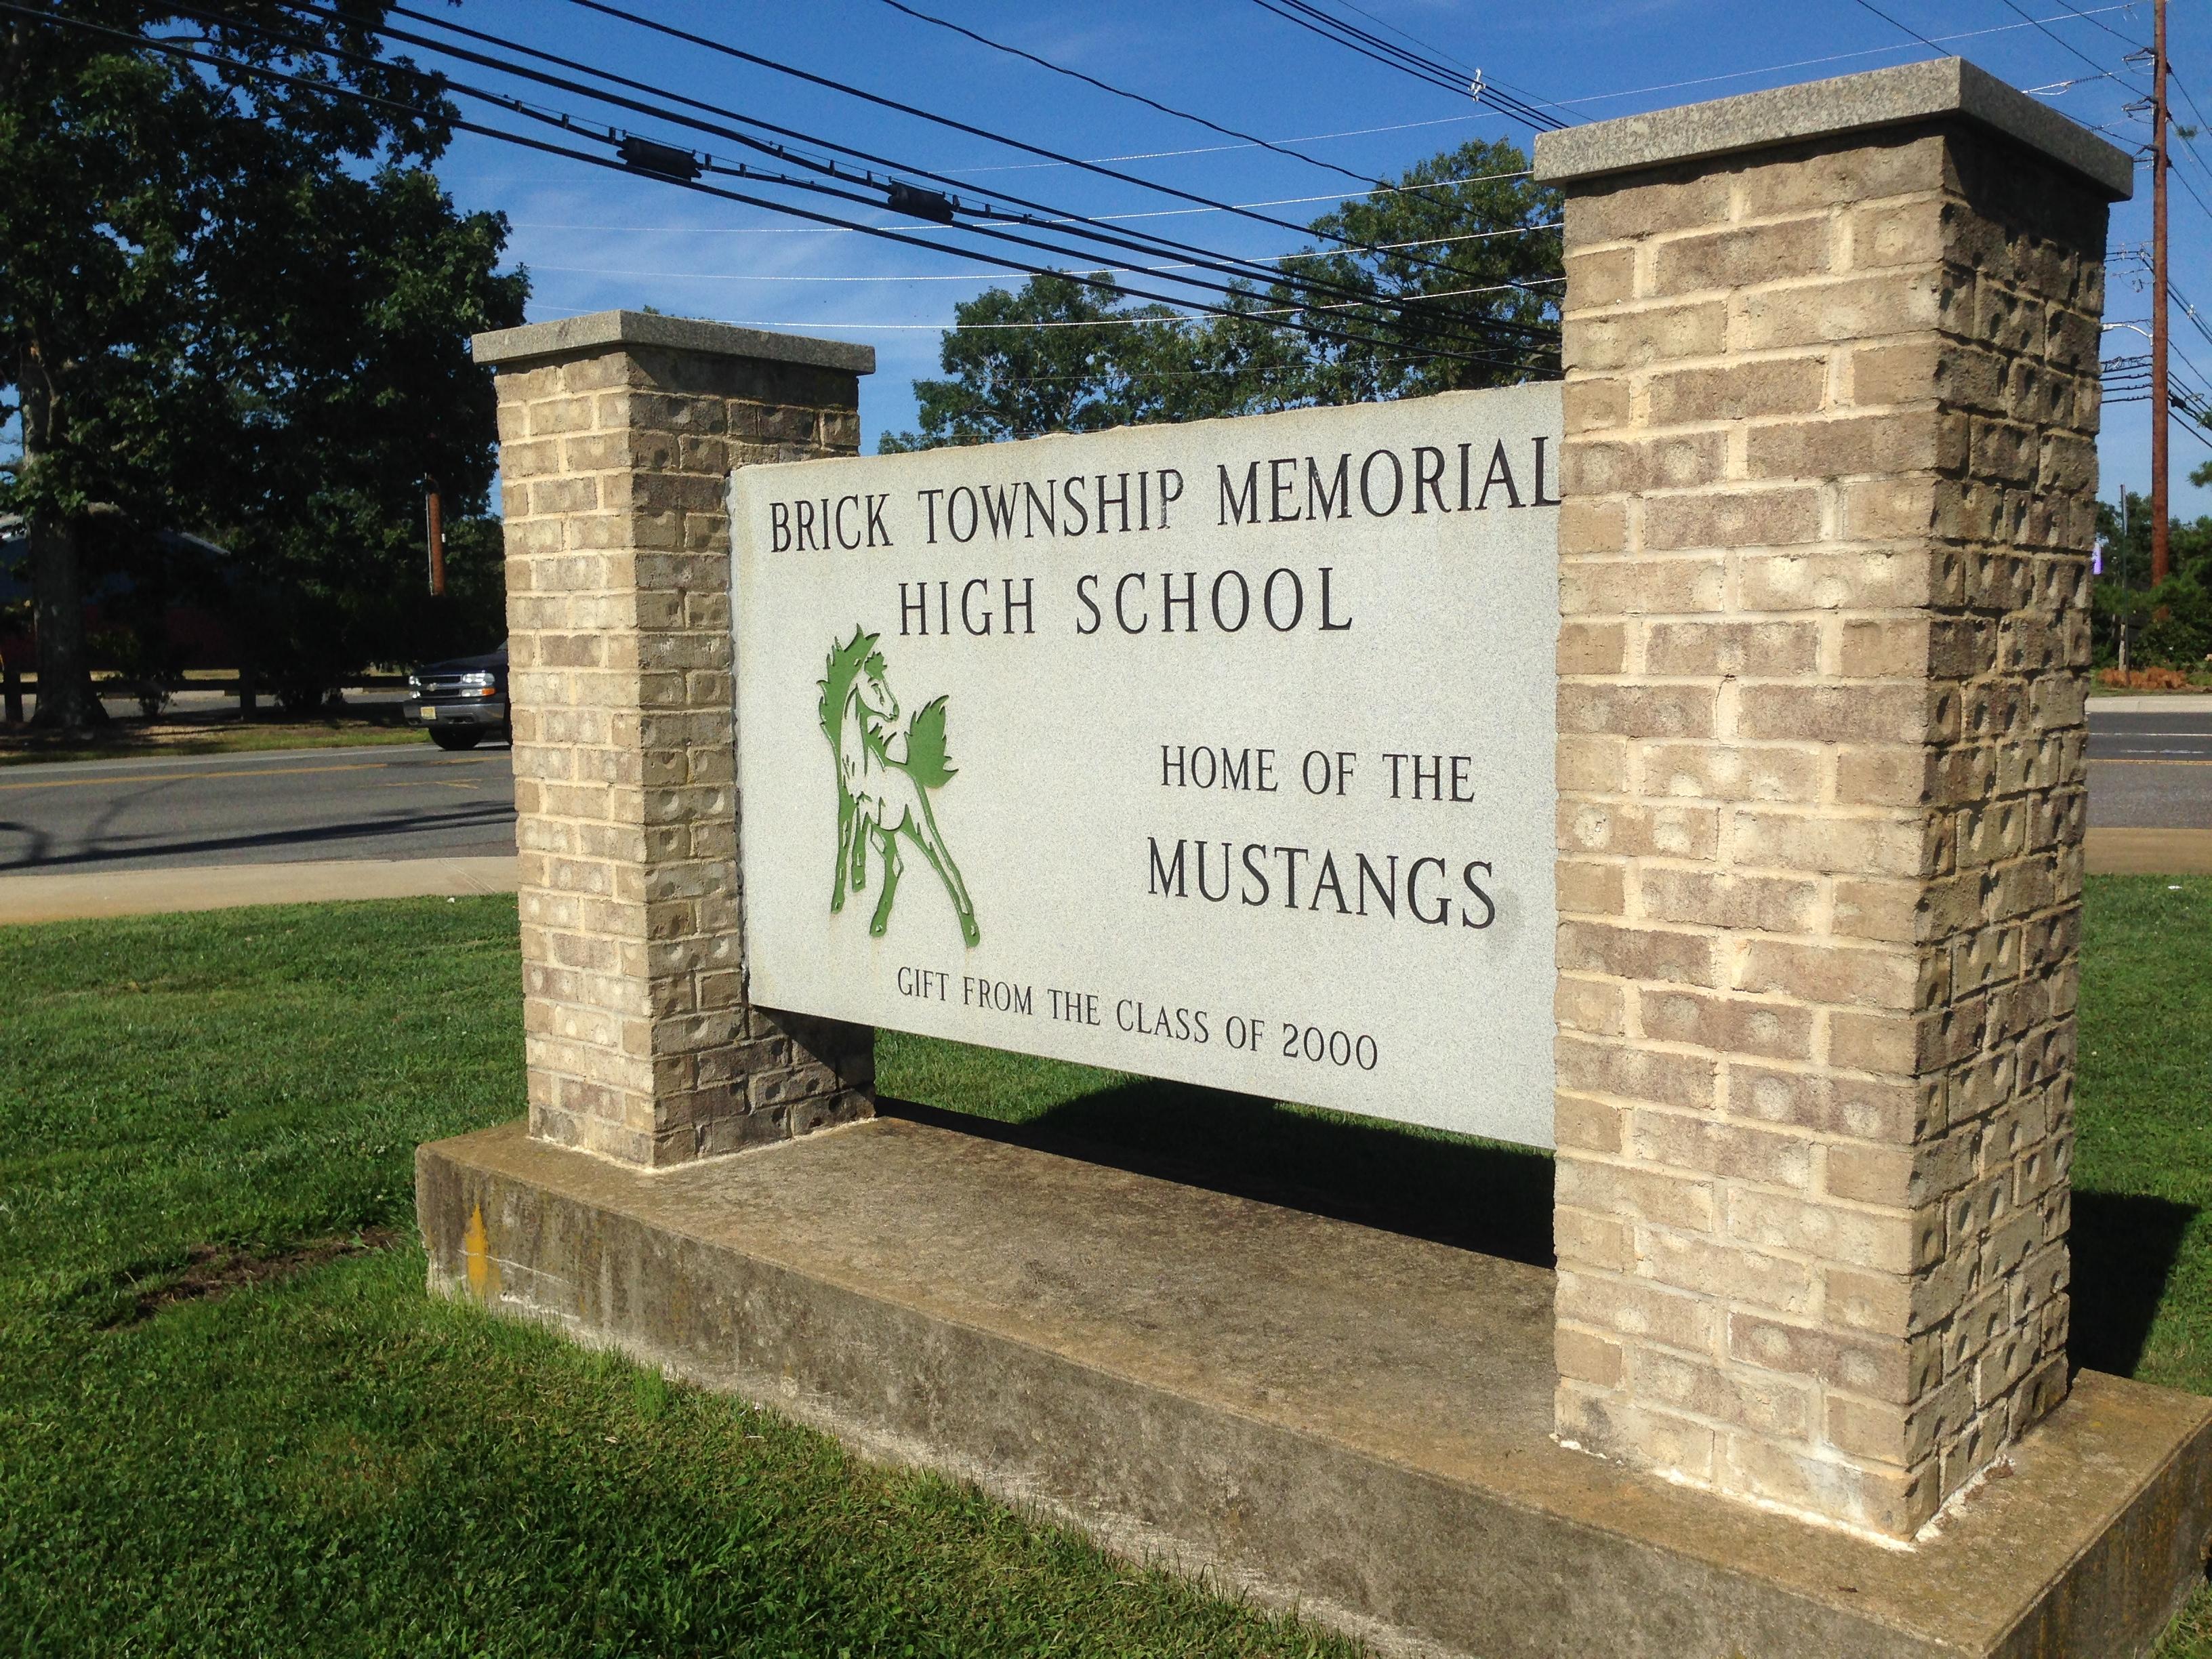 Brick Township Memorial High School (Photo: Daniel Nee)